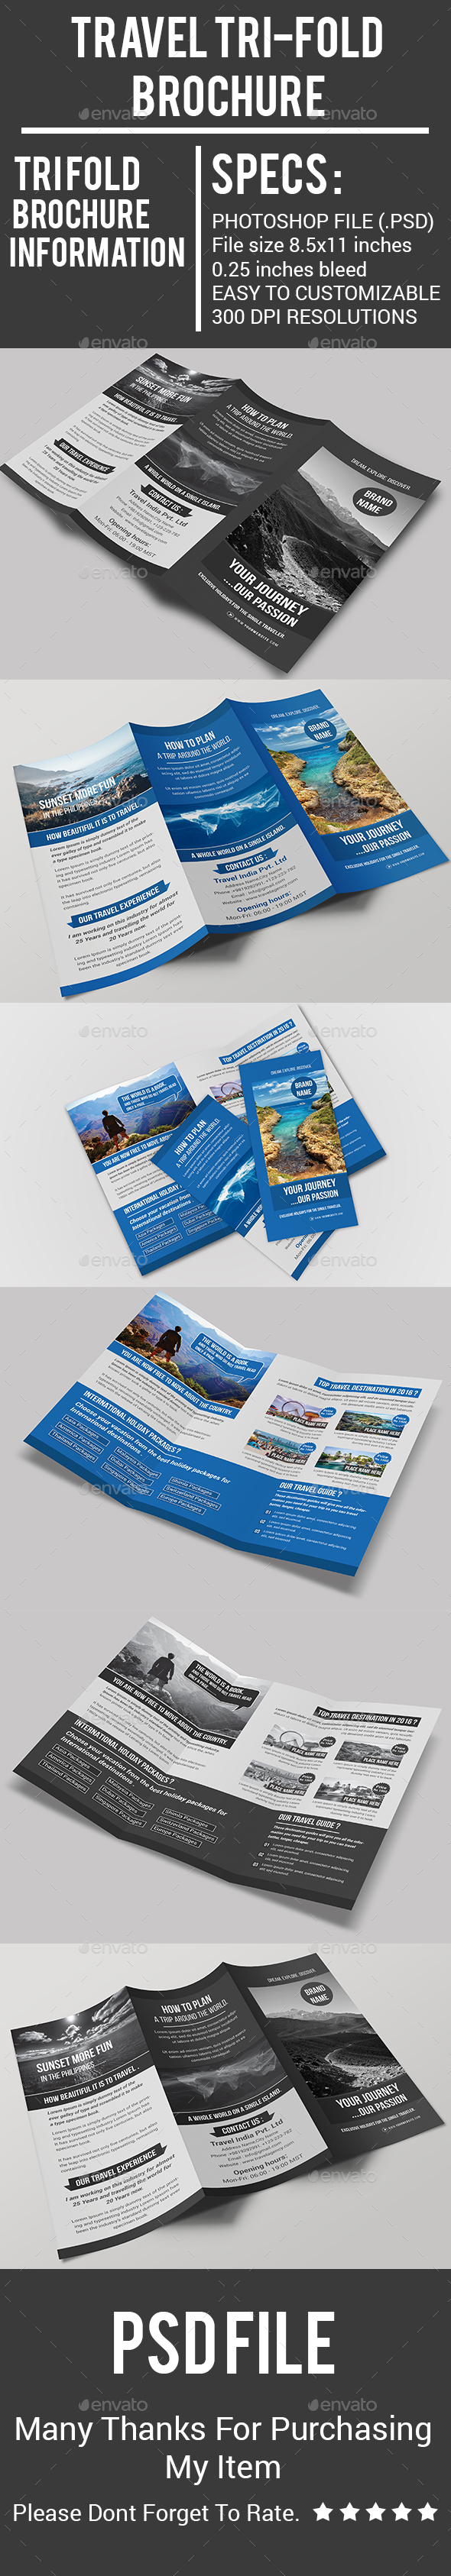 Travel Tri-Fold Brochure - Corporate Brochures